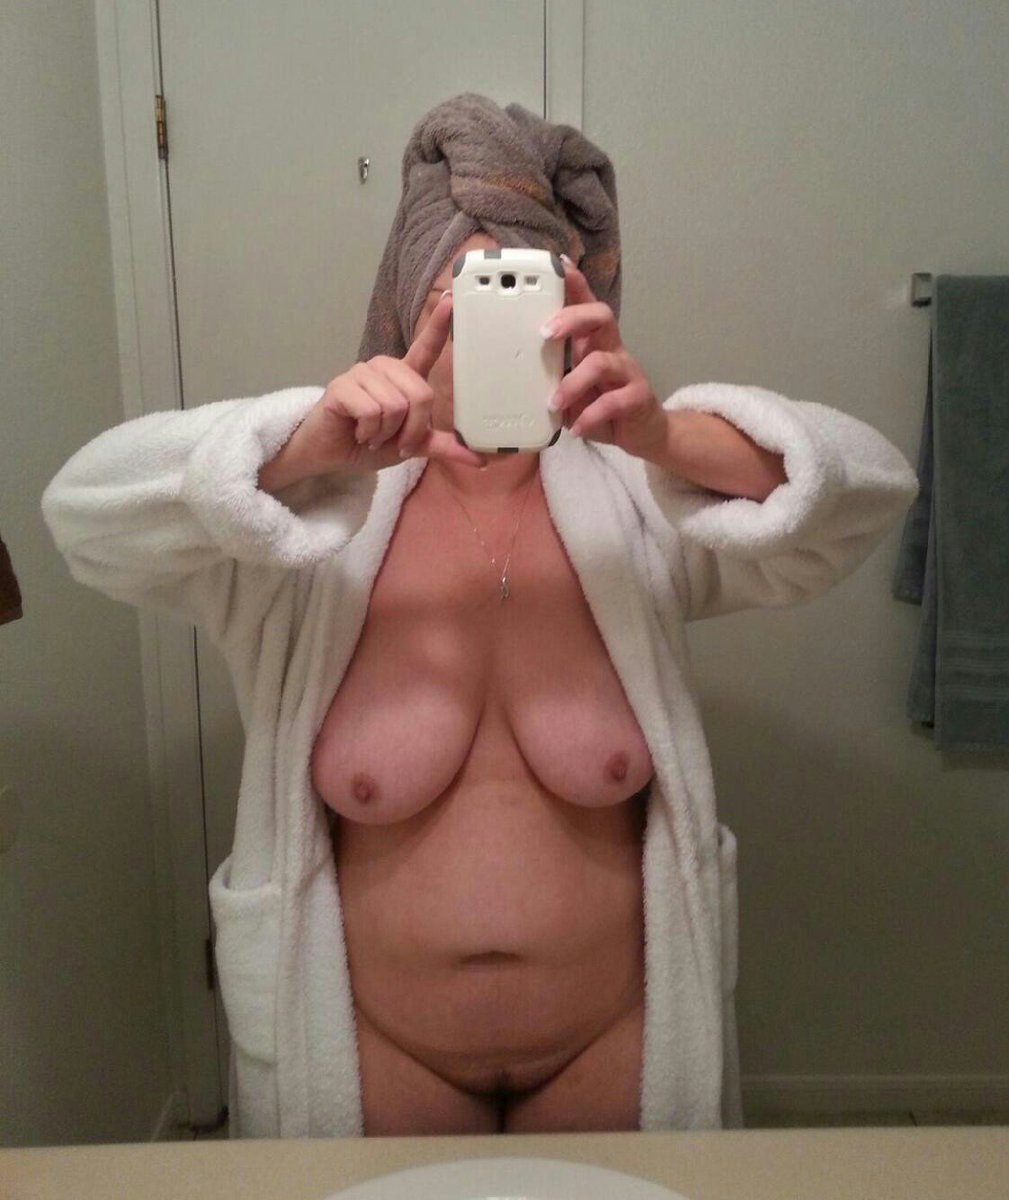 Nude Selfie 10181